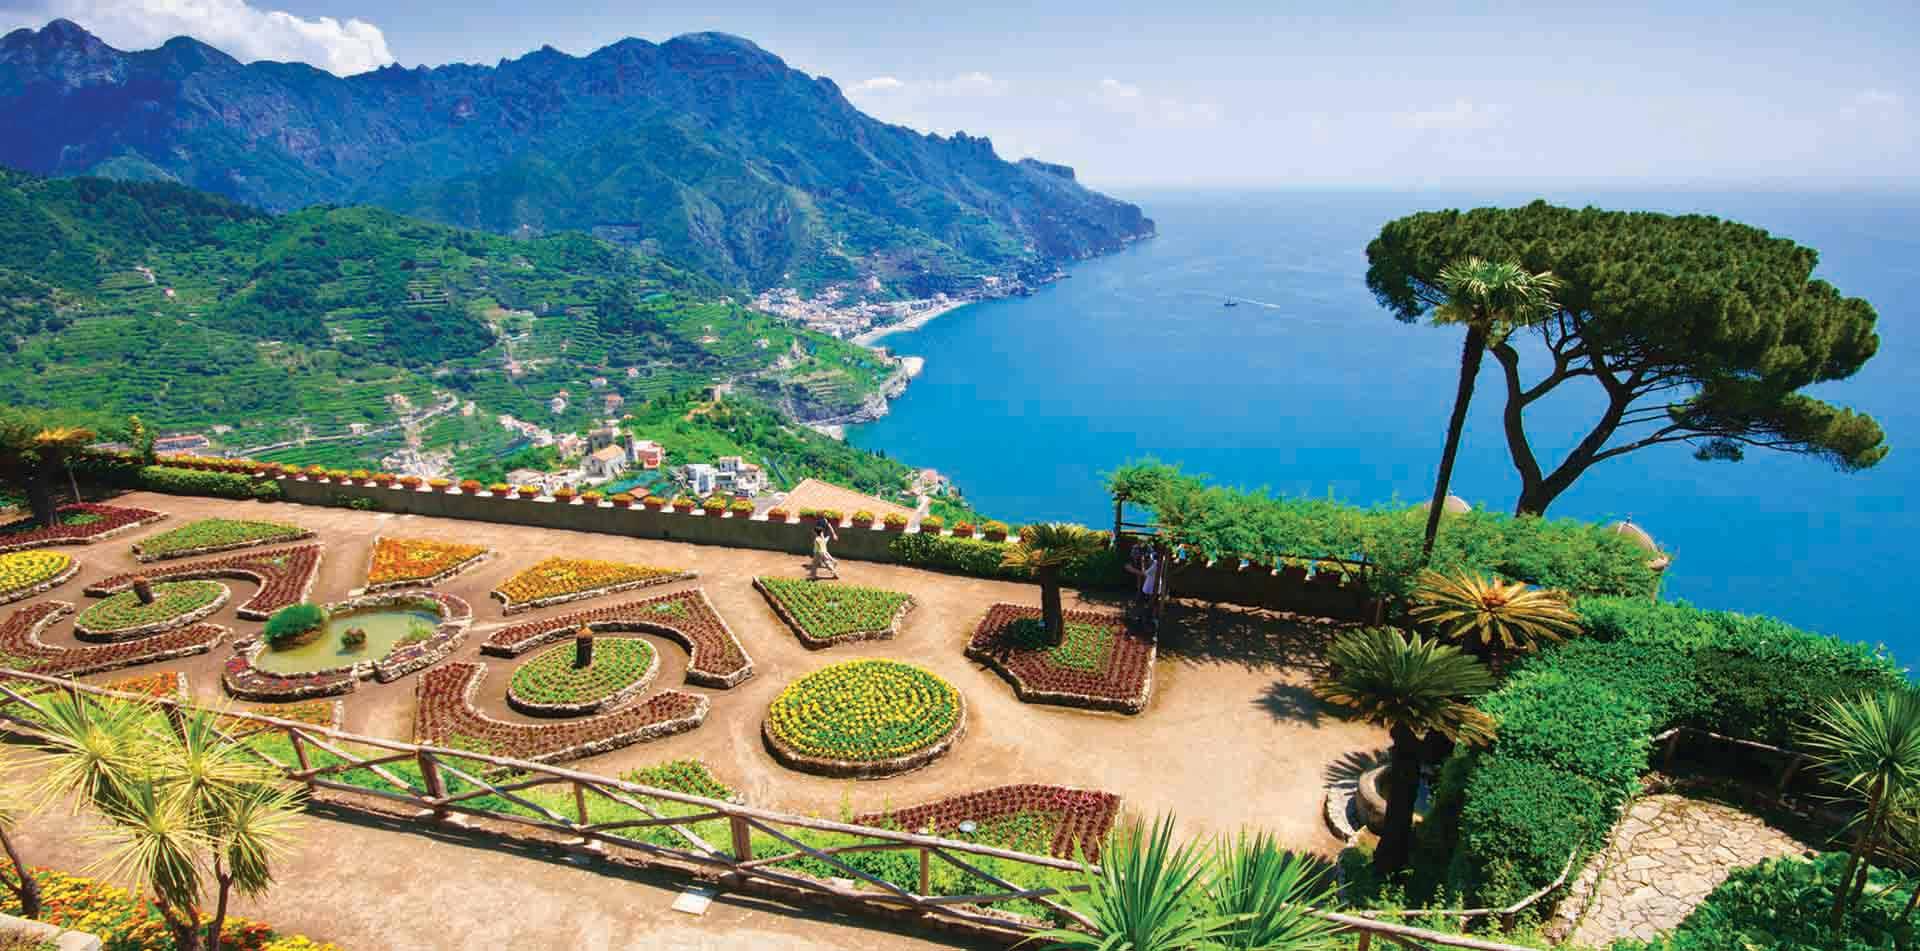 Gardens Overlooking Amalfi Coast, Italy